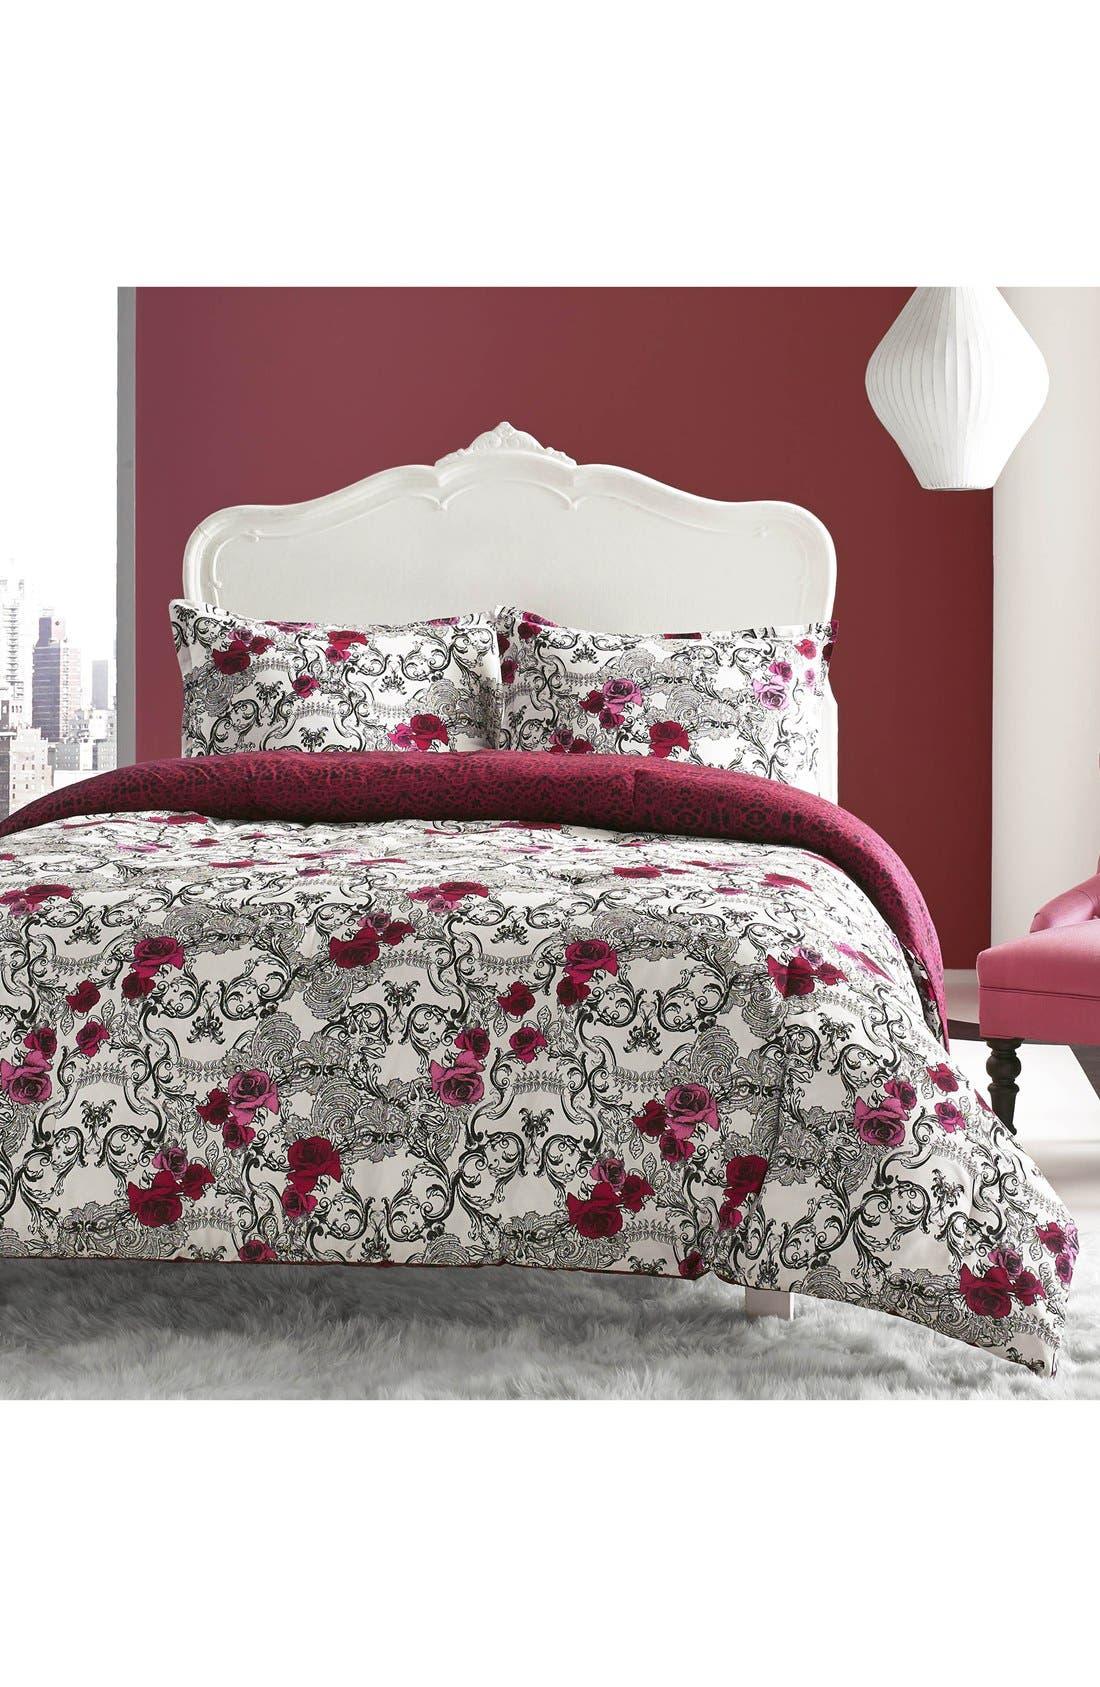 Alternate Image 1 Selected - Betsey Johnson Bedding Rock Out Reversible Comforter & Sham Set